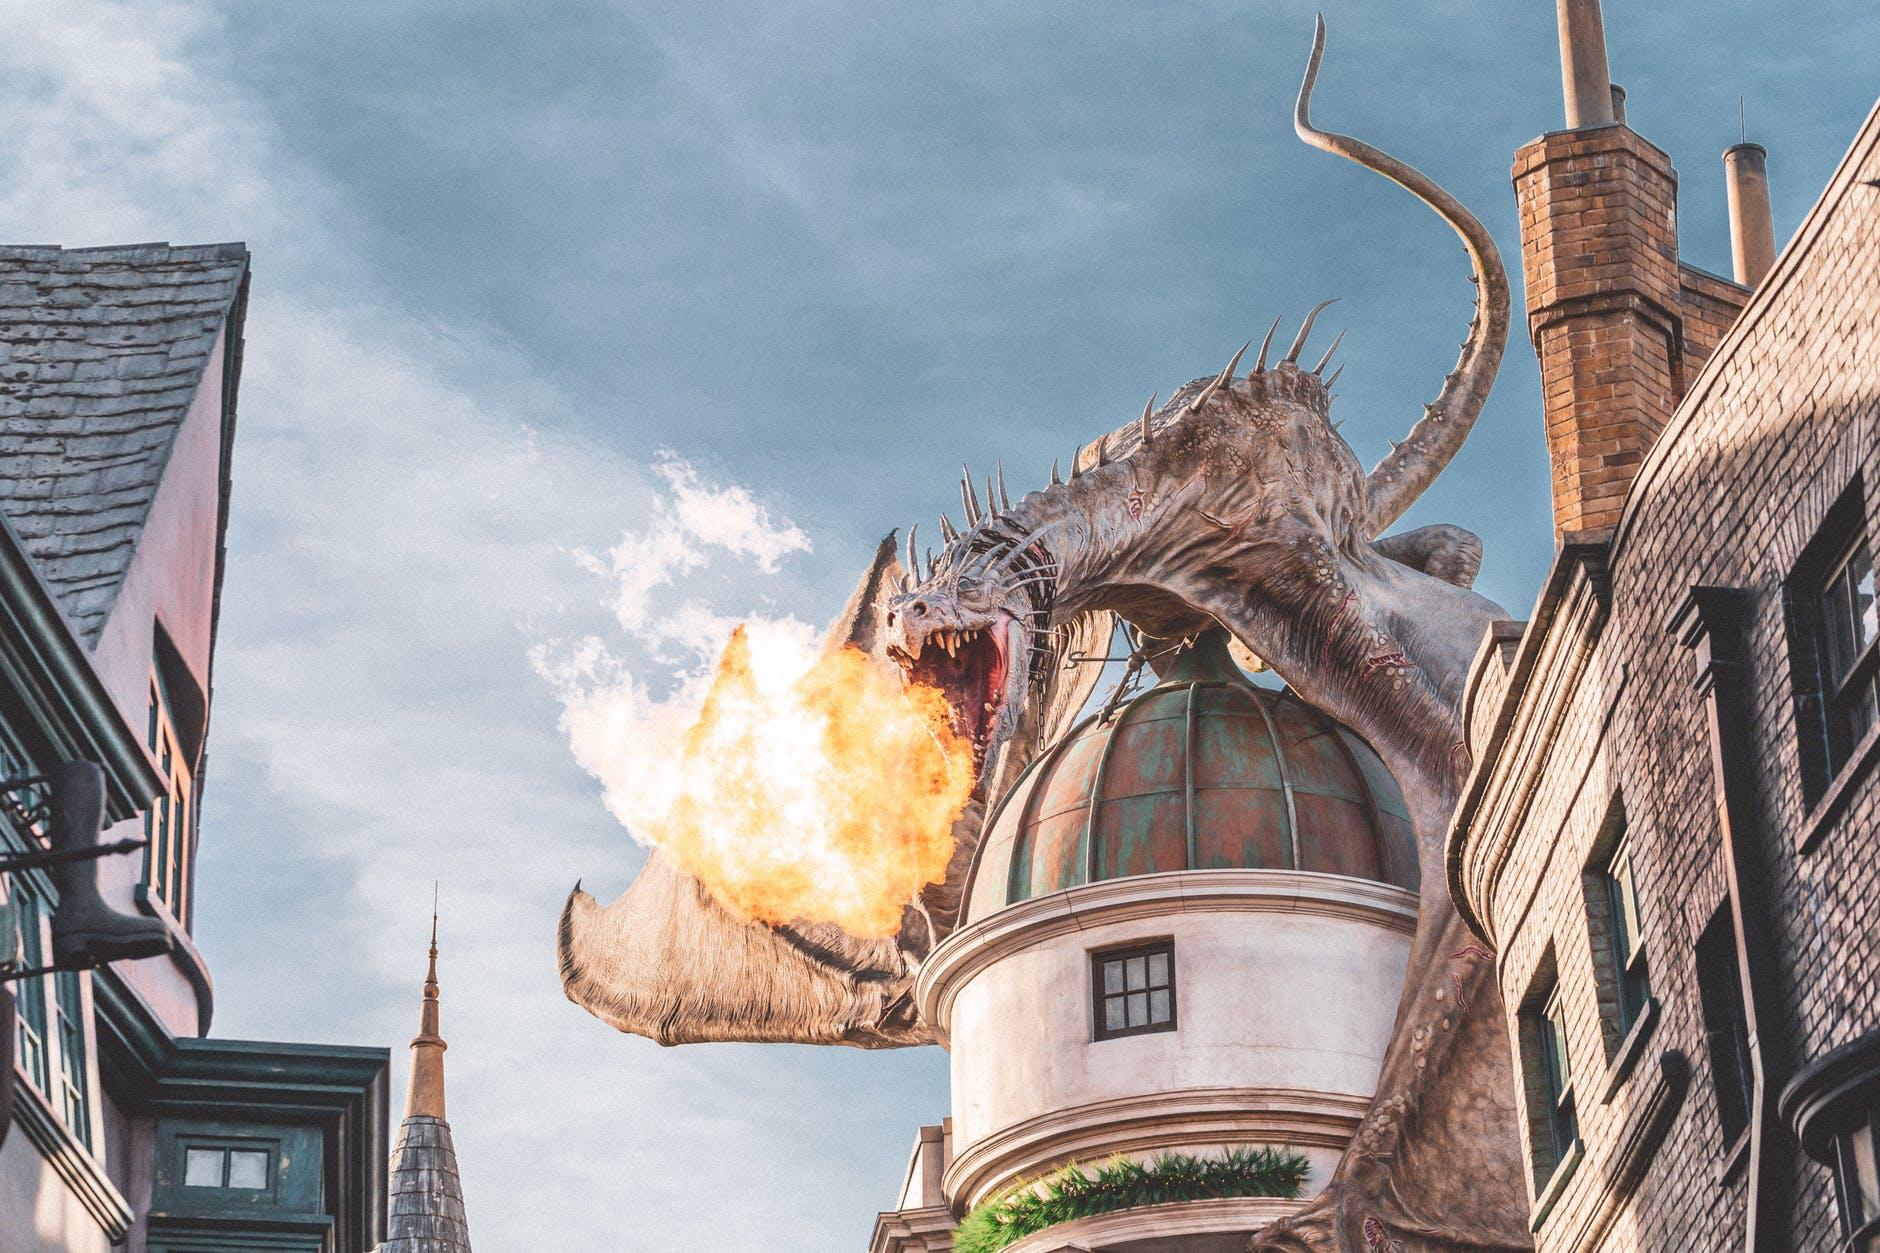 hungarian horntail dragon at universal studios